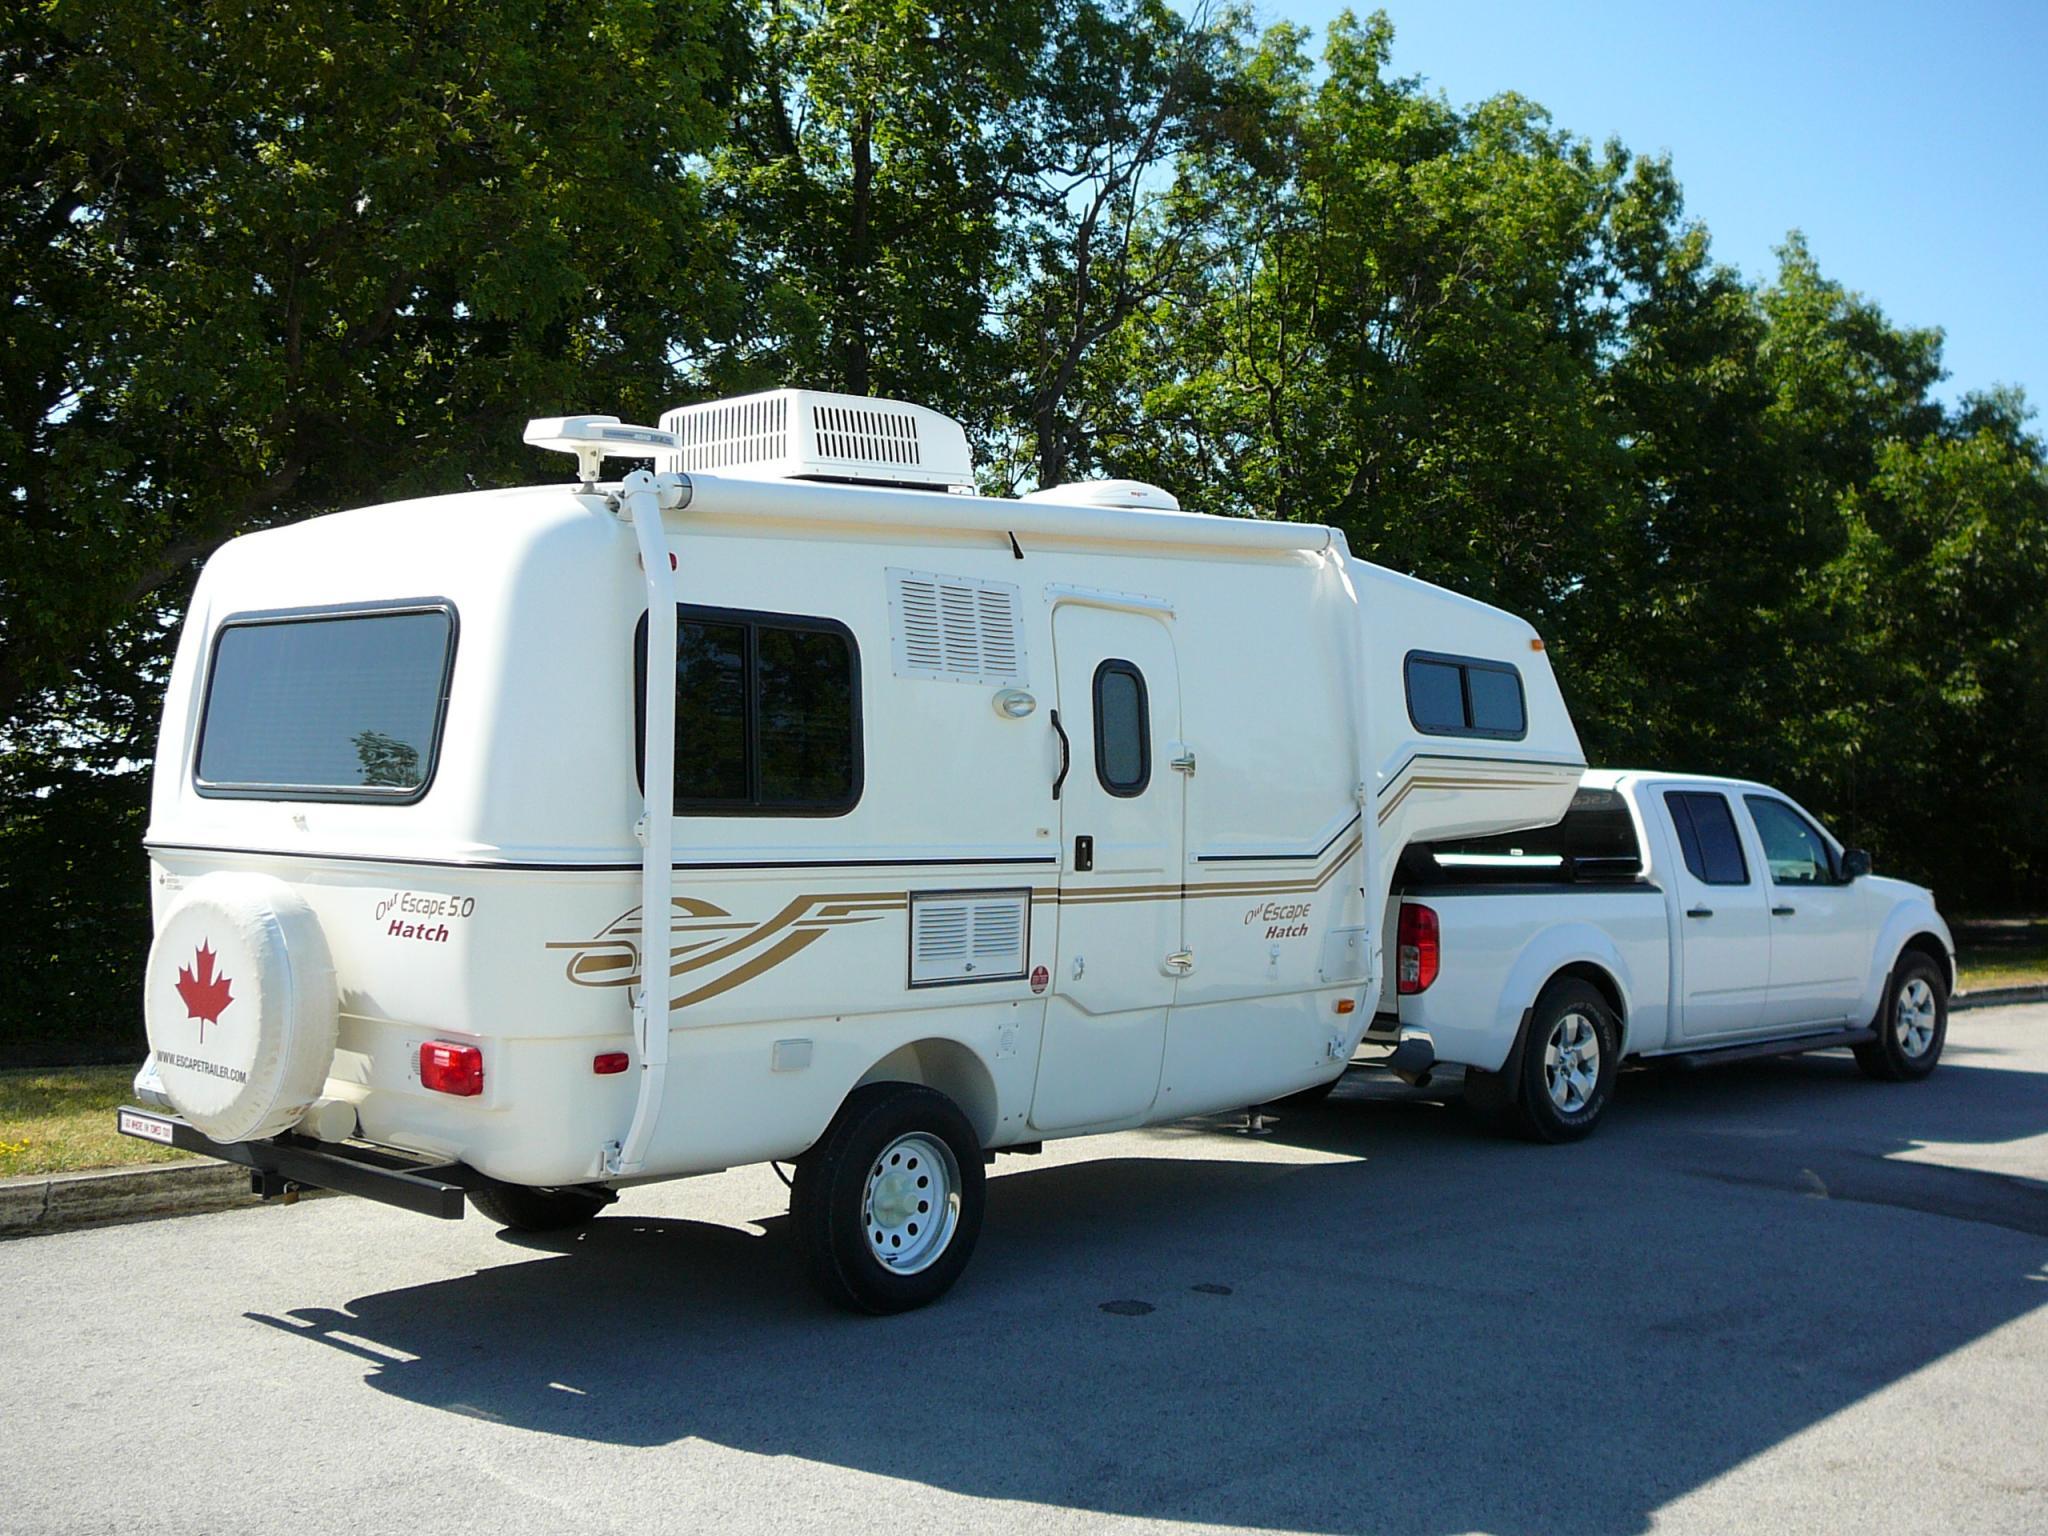 Towing a Popup camper   Nissan Frontier Forum